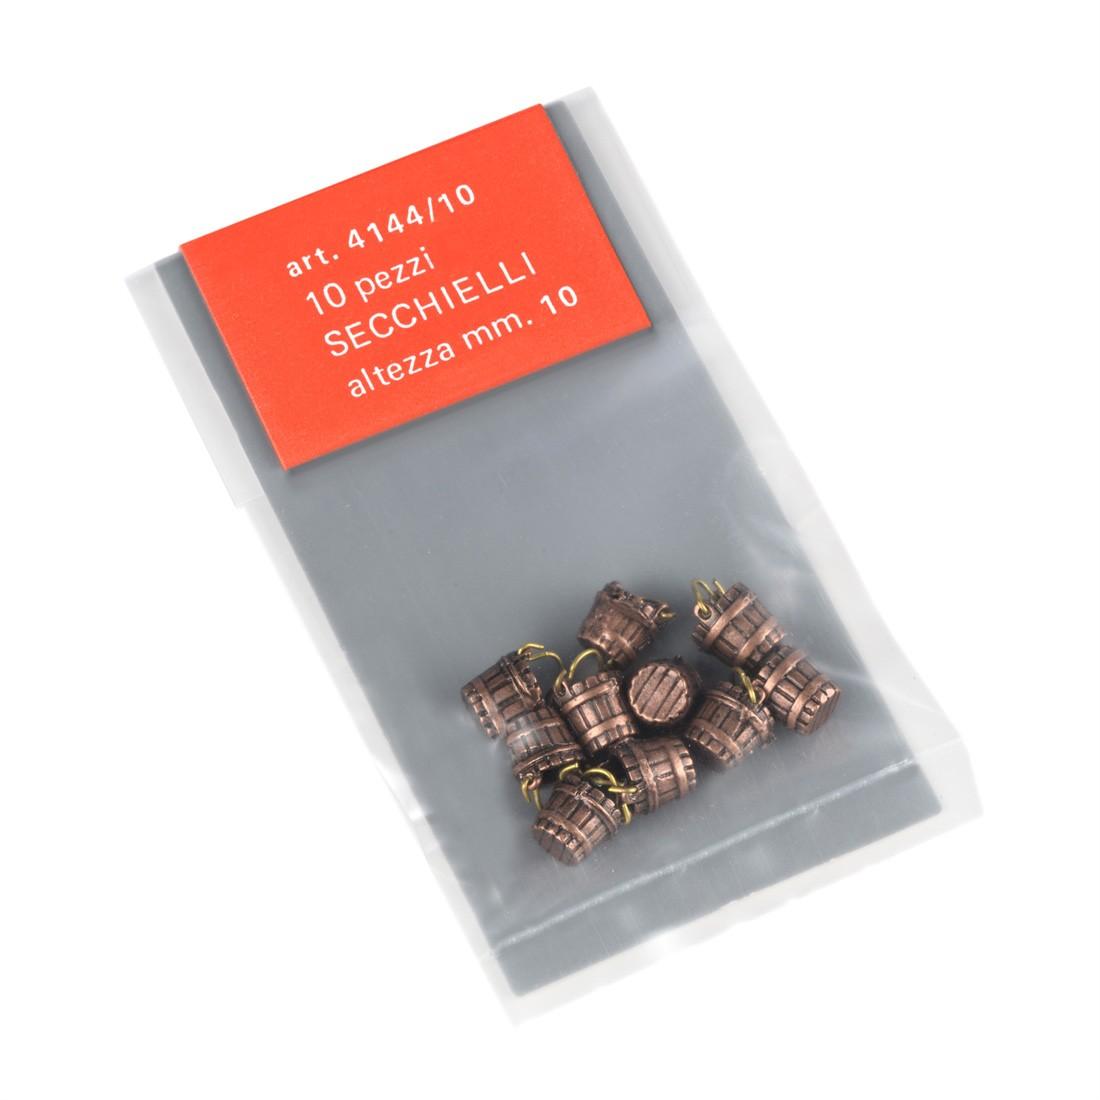 Seaux mm.10 métal avec anse